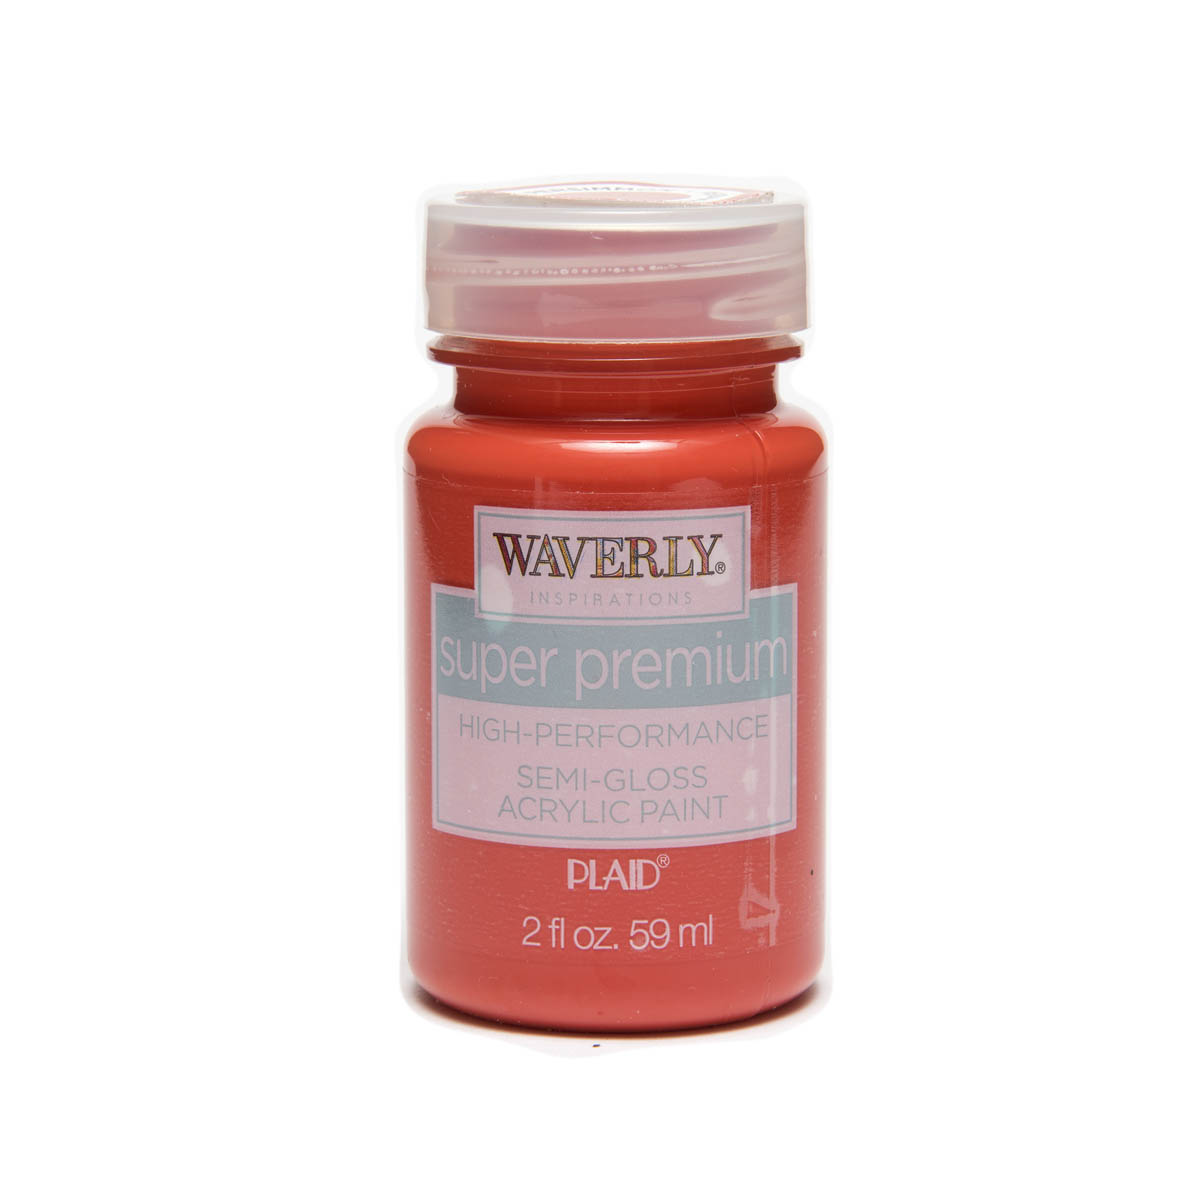 Waverly ® Inspirations Super Premium Semi-Gloss Acrylic Paint - Persimmon, 2 oz.